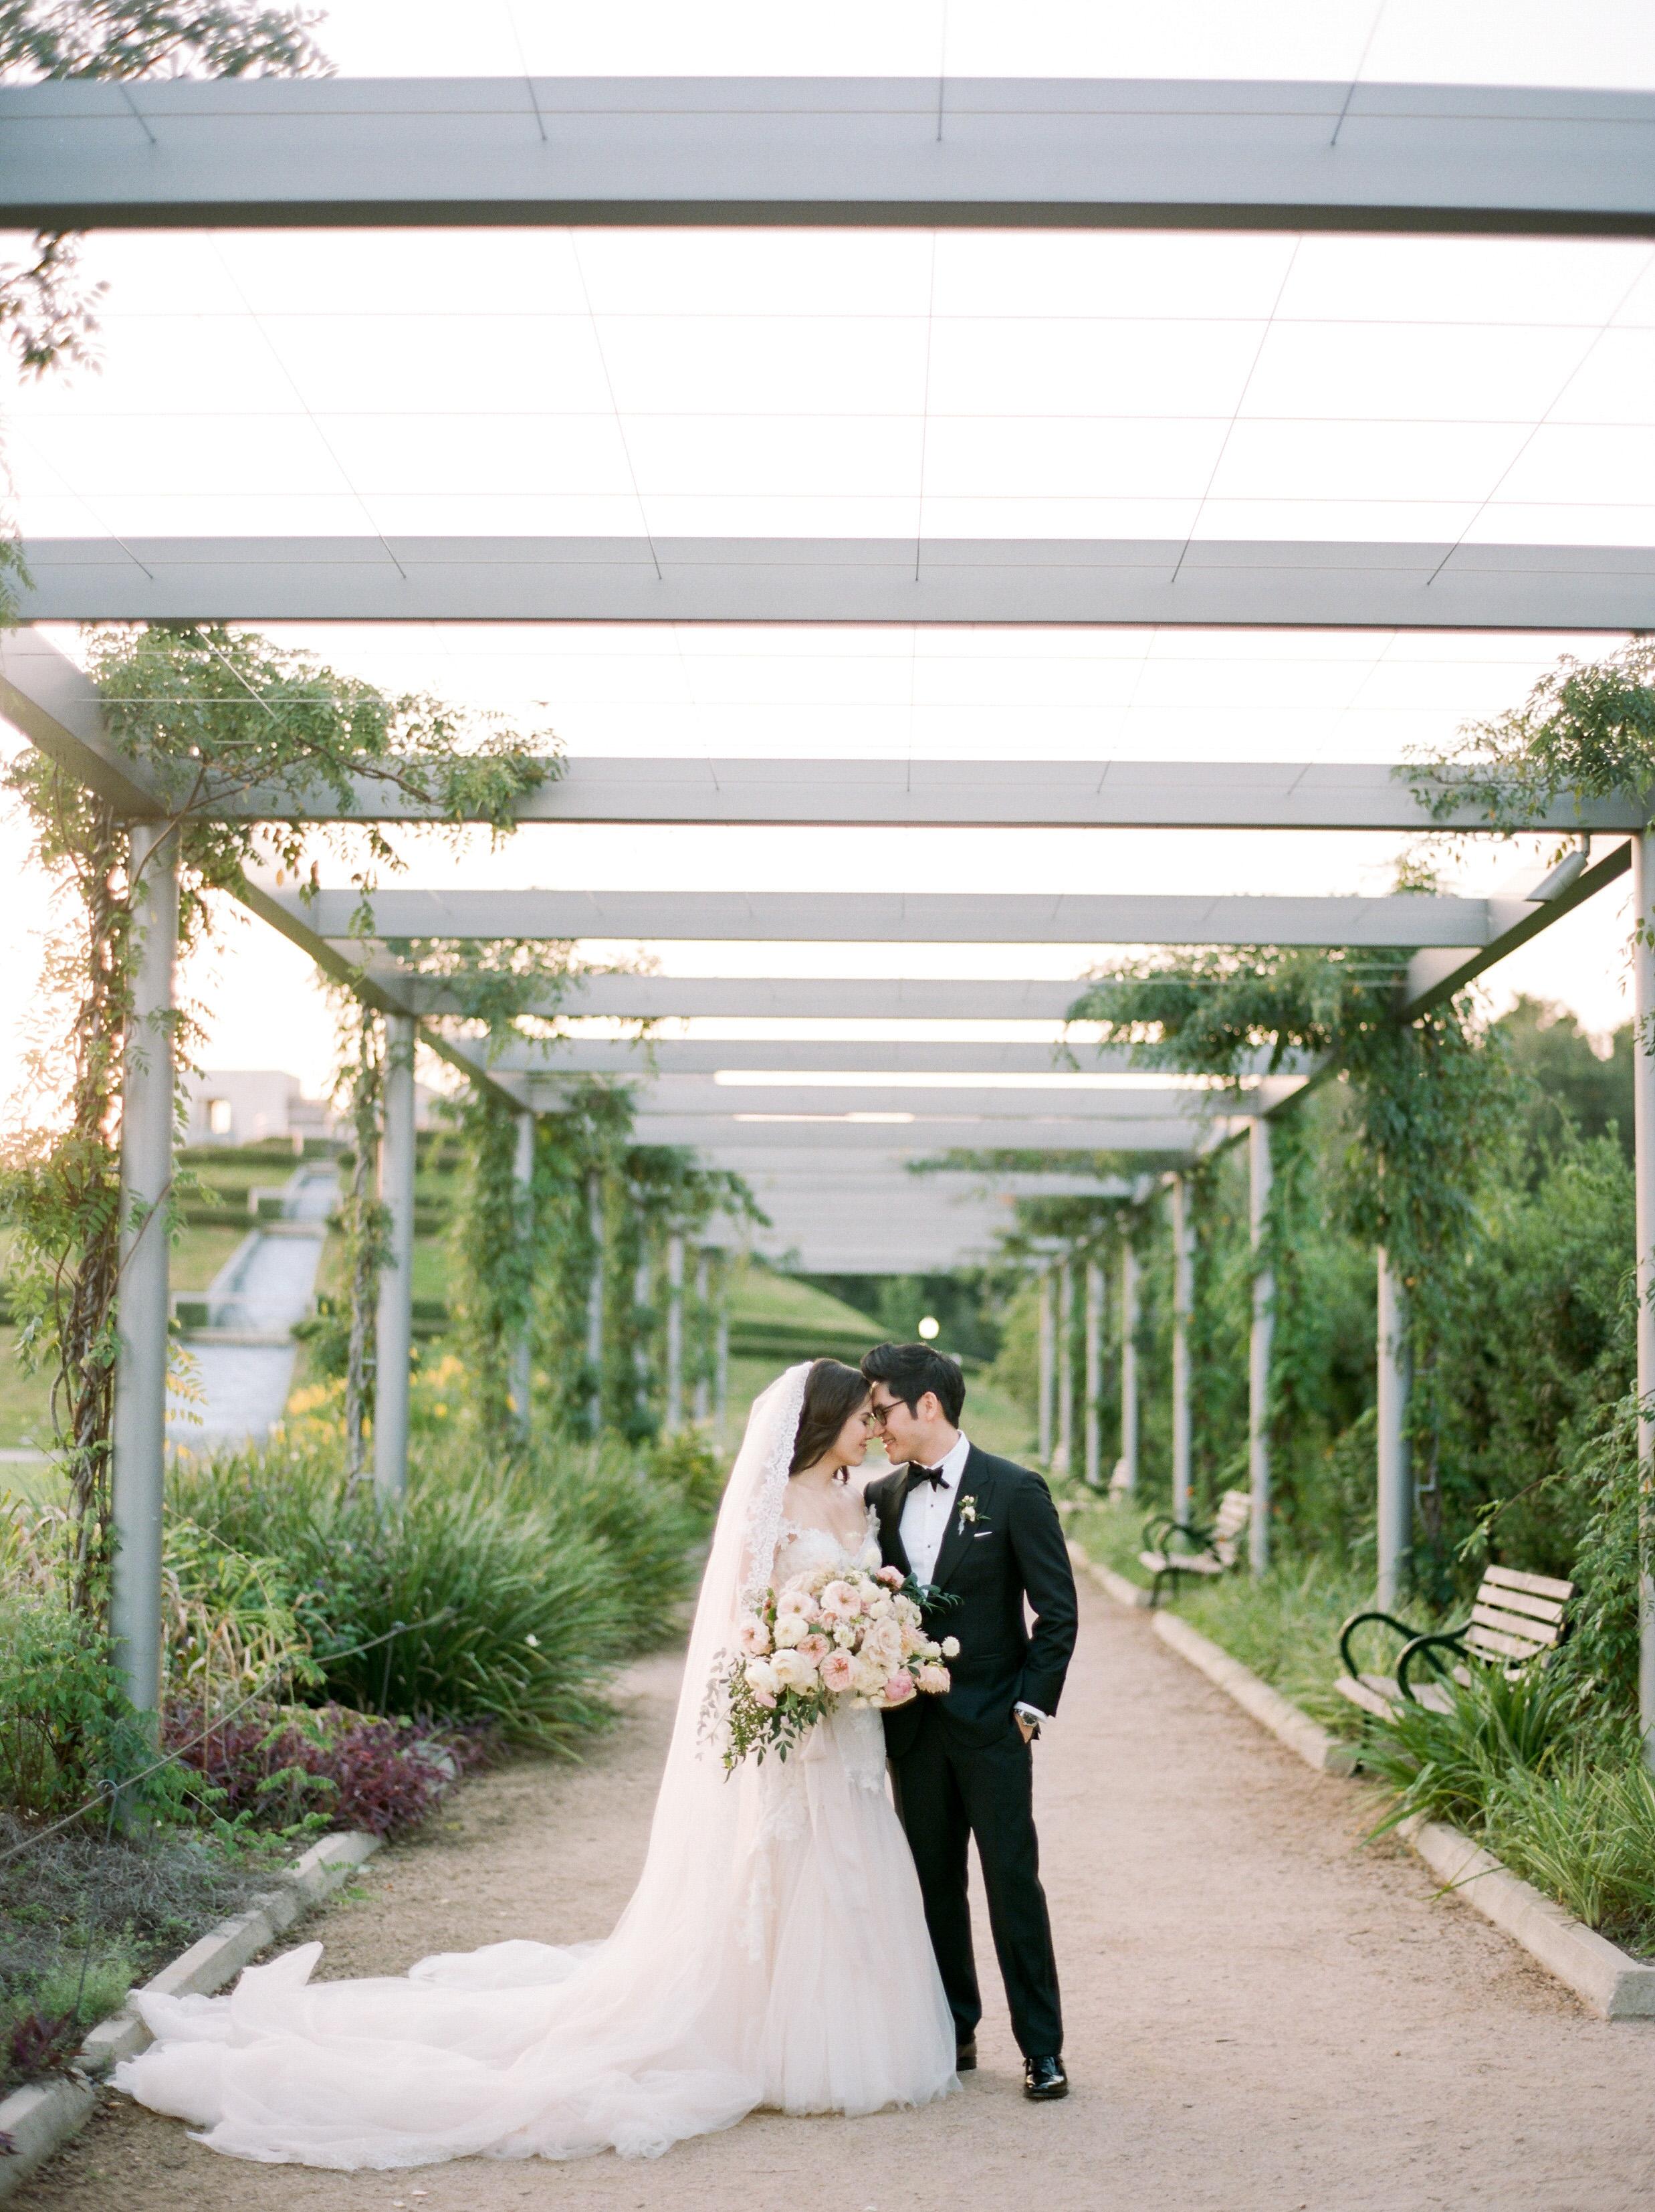 Martha-Stewart-Wedding-Dana-Fernandez-Photography-Josh-Texas-Film-Houston-Wedding-Fine-Art-Photographer-McGovern-Centennial-Gardens-Top-Best-66.jpg